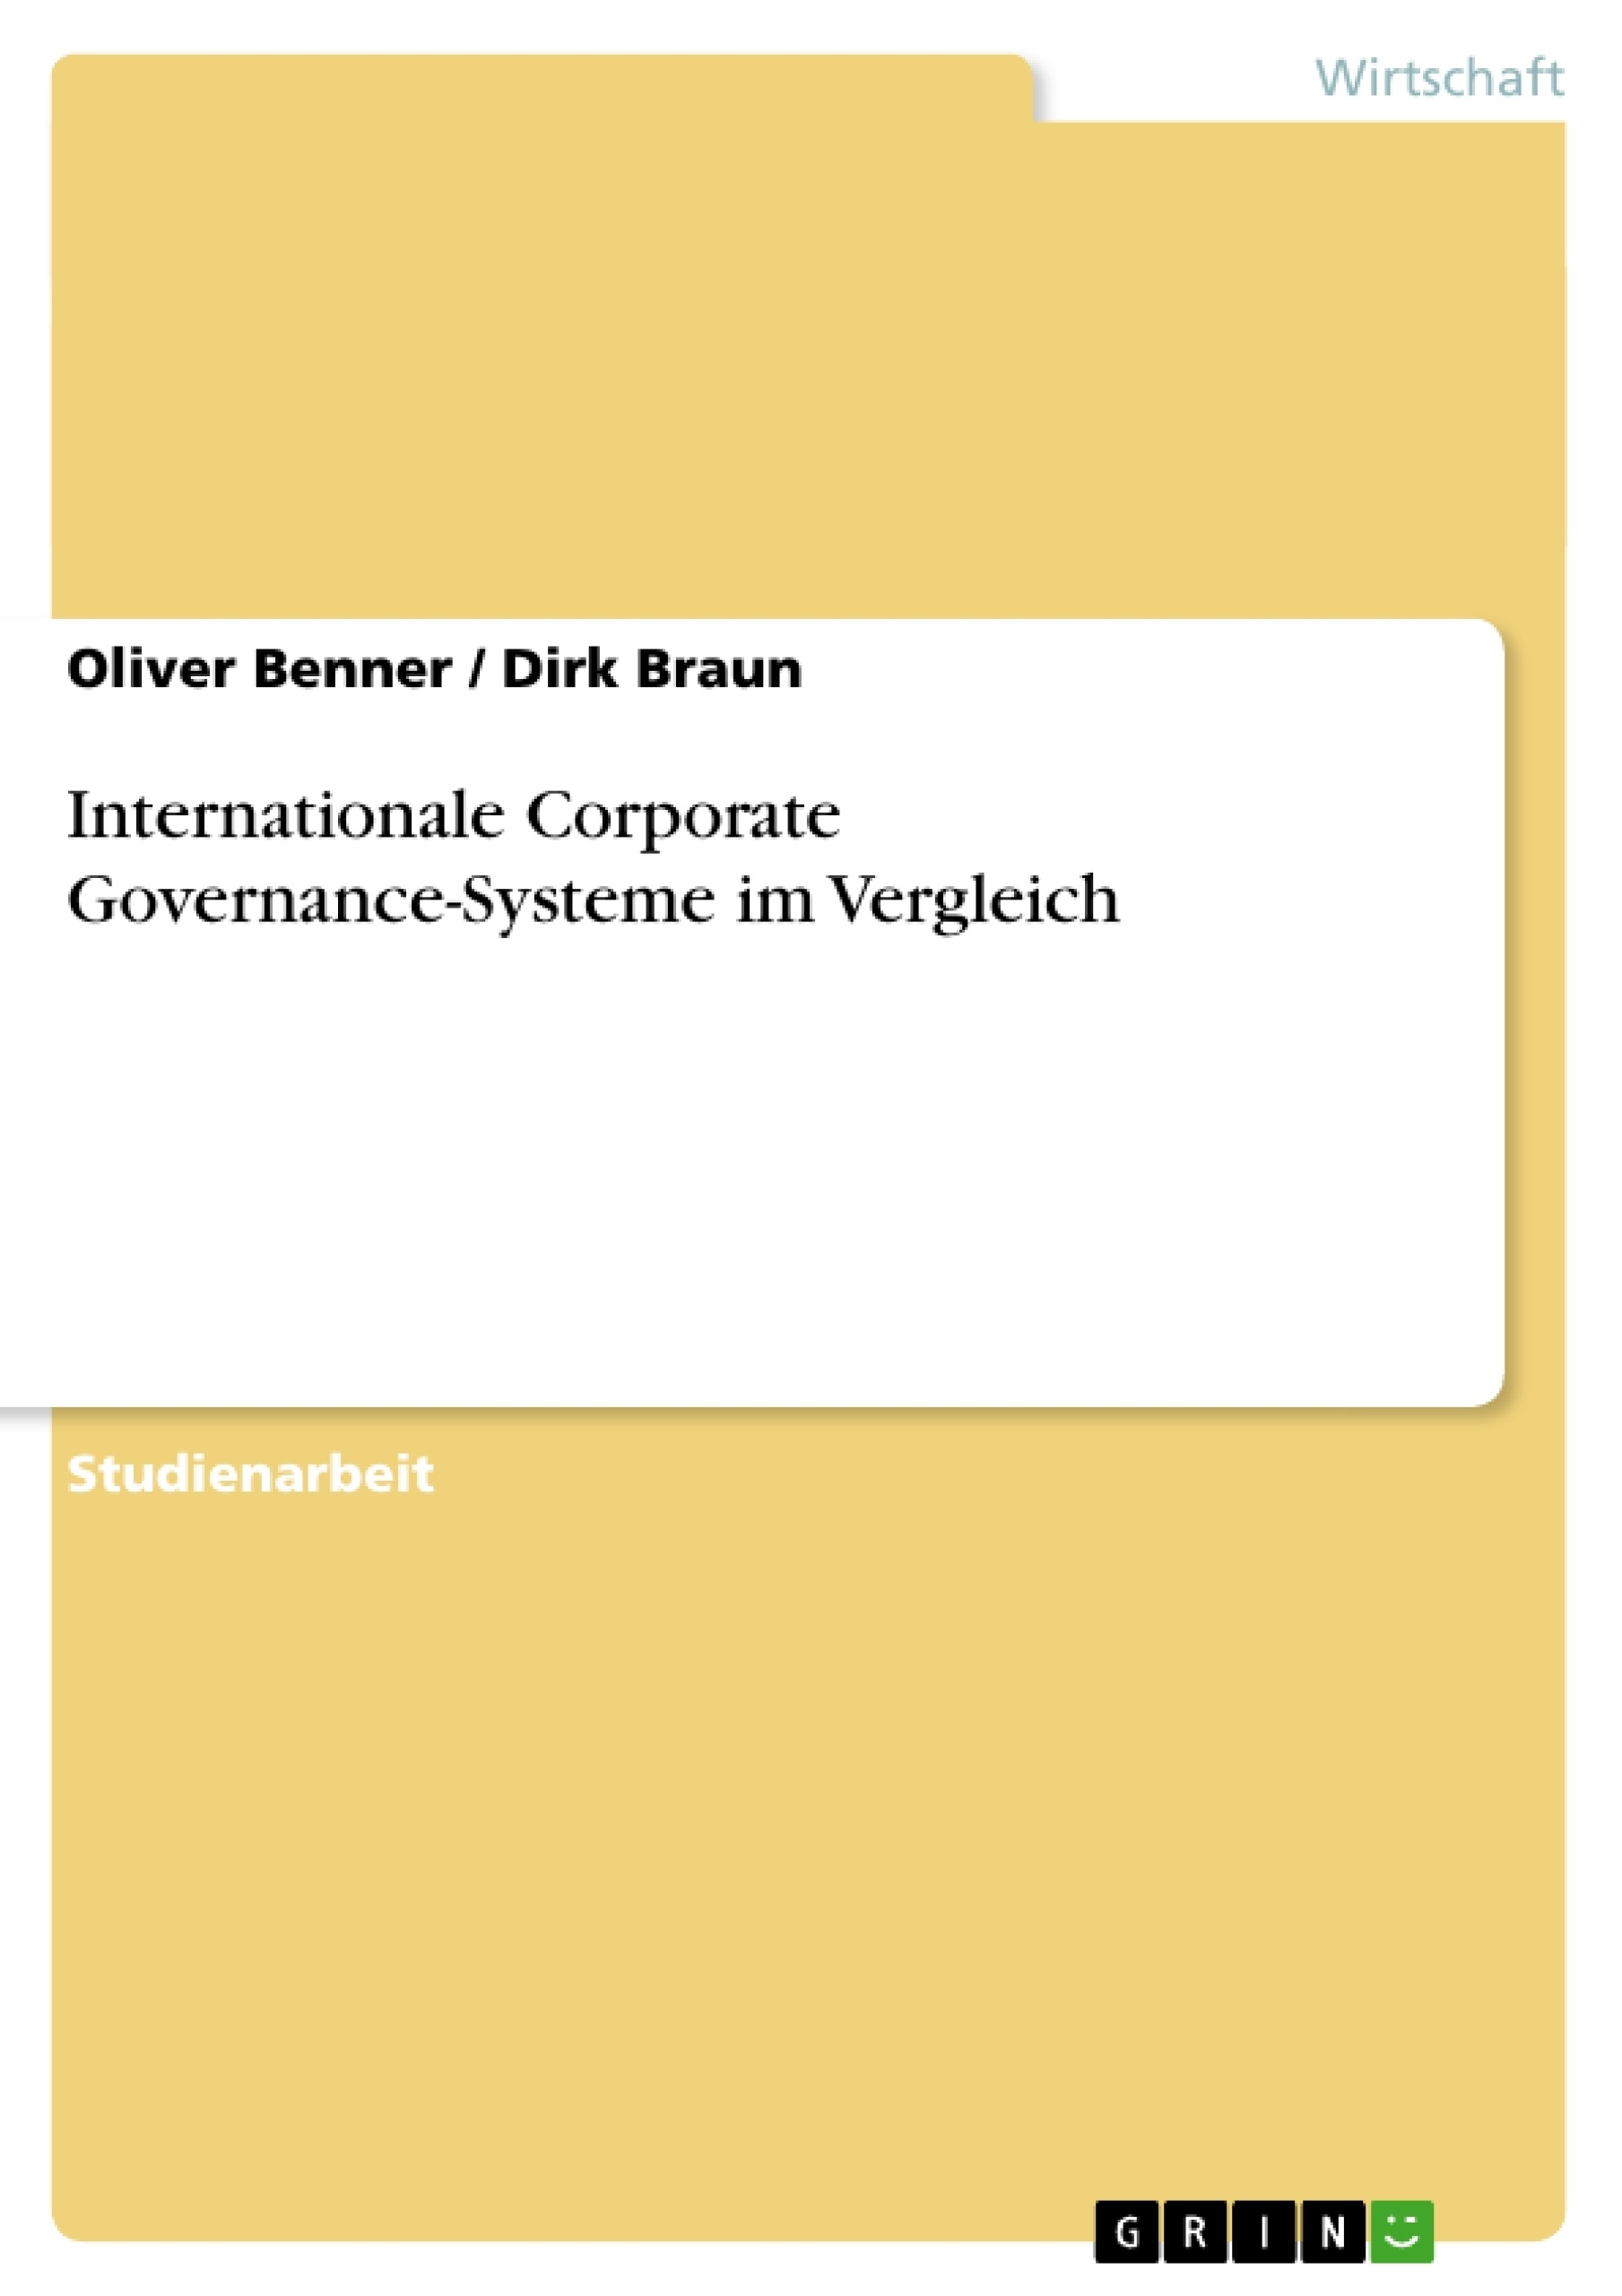 Titel: Internationale Corporate Governance-Systeme im Vergleich